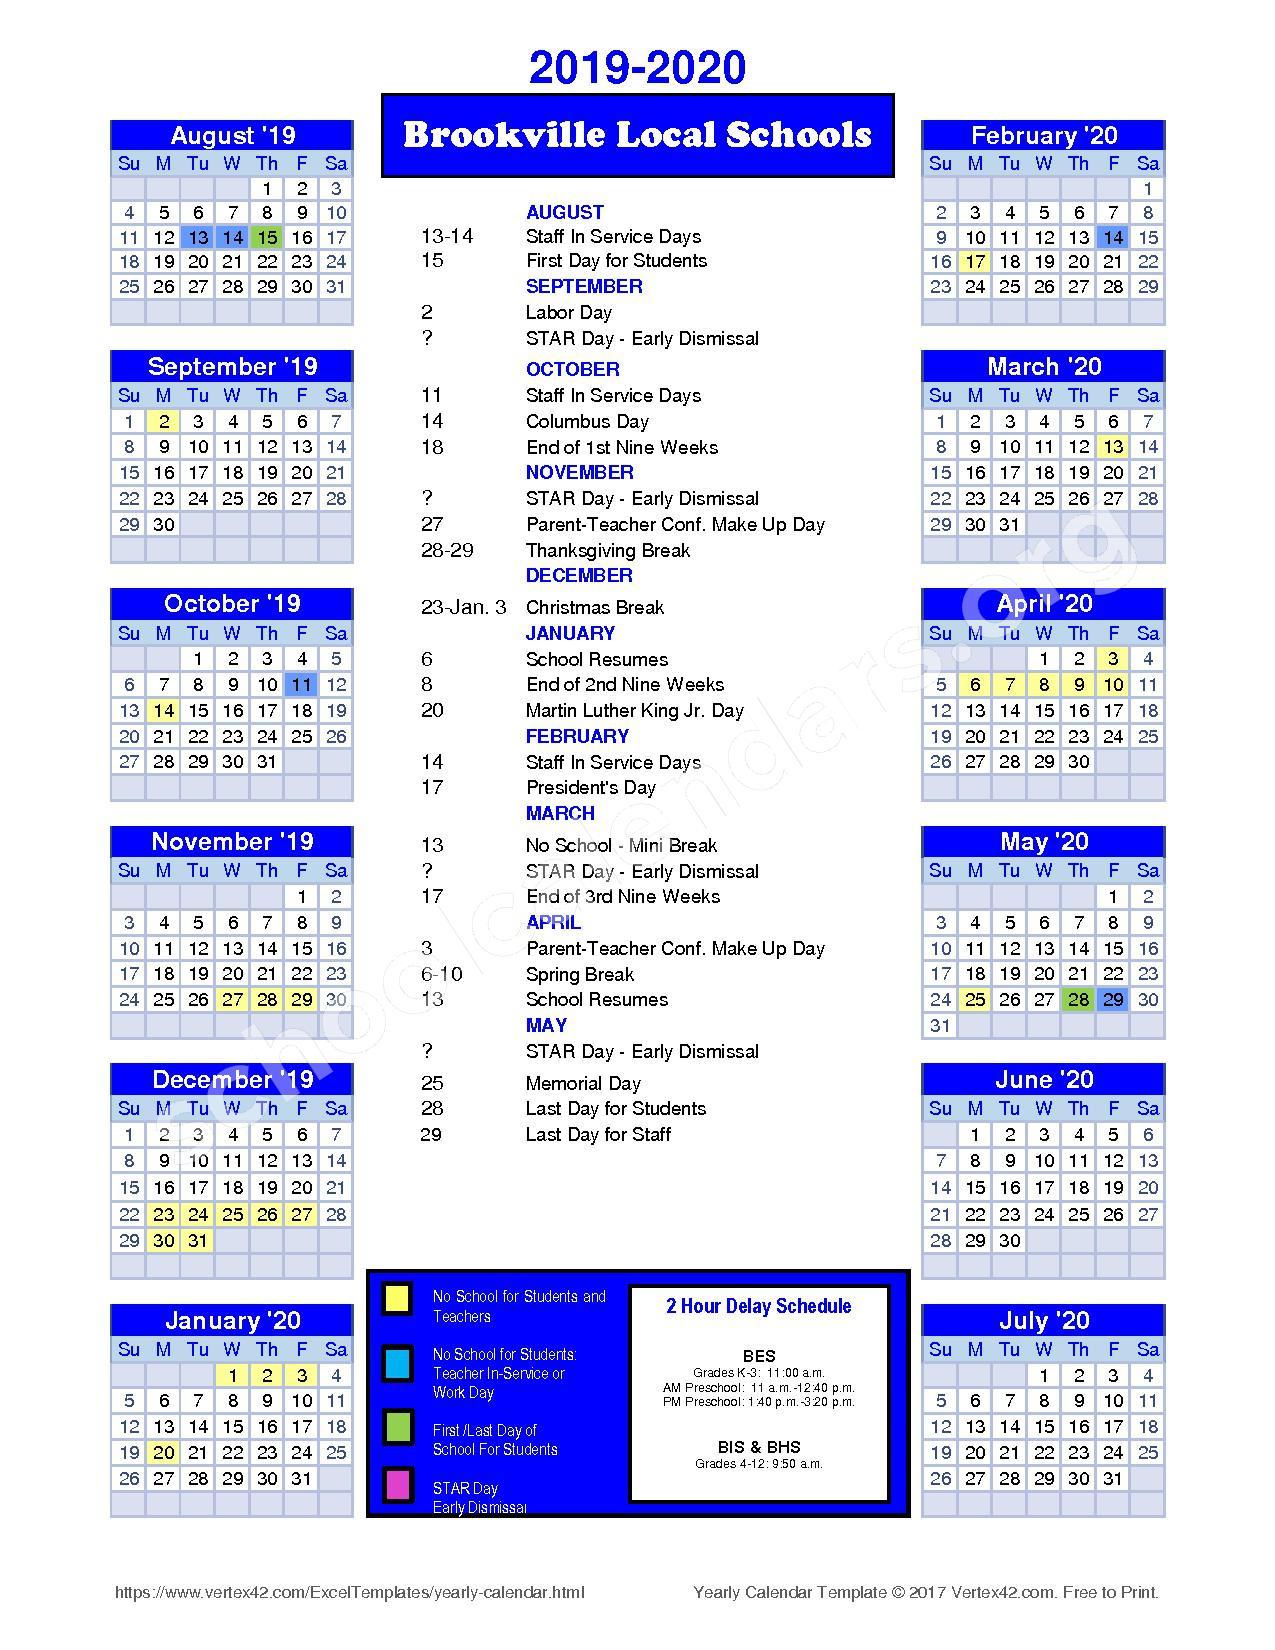 2019 - 2020 District Calendar – Brookville Local Schools – page 1